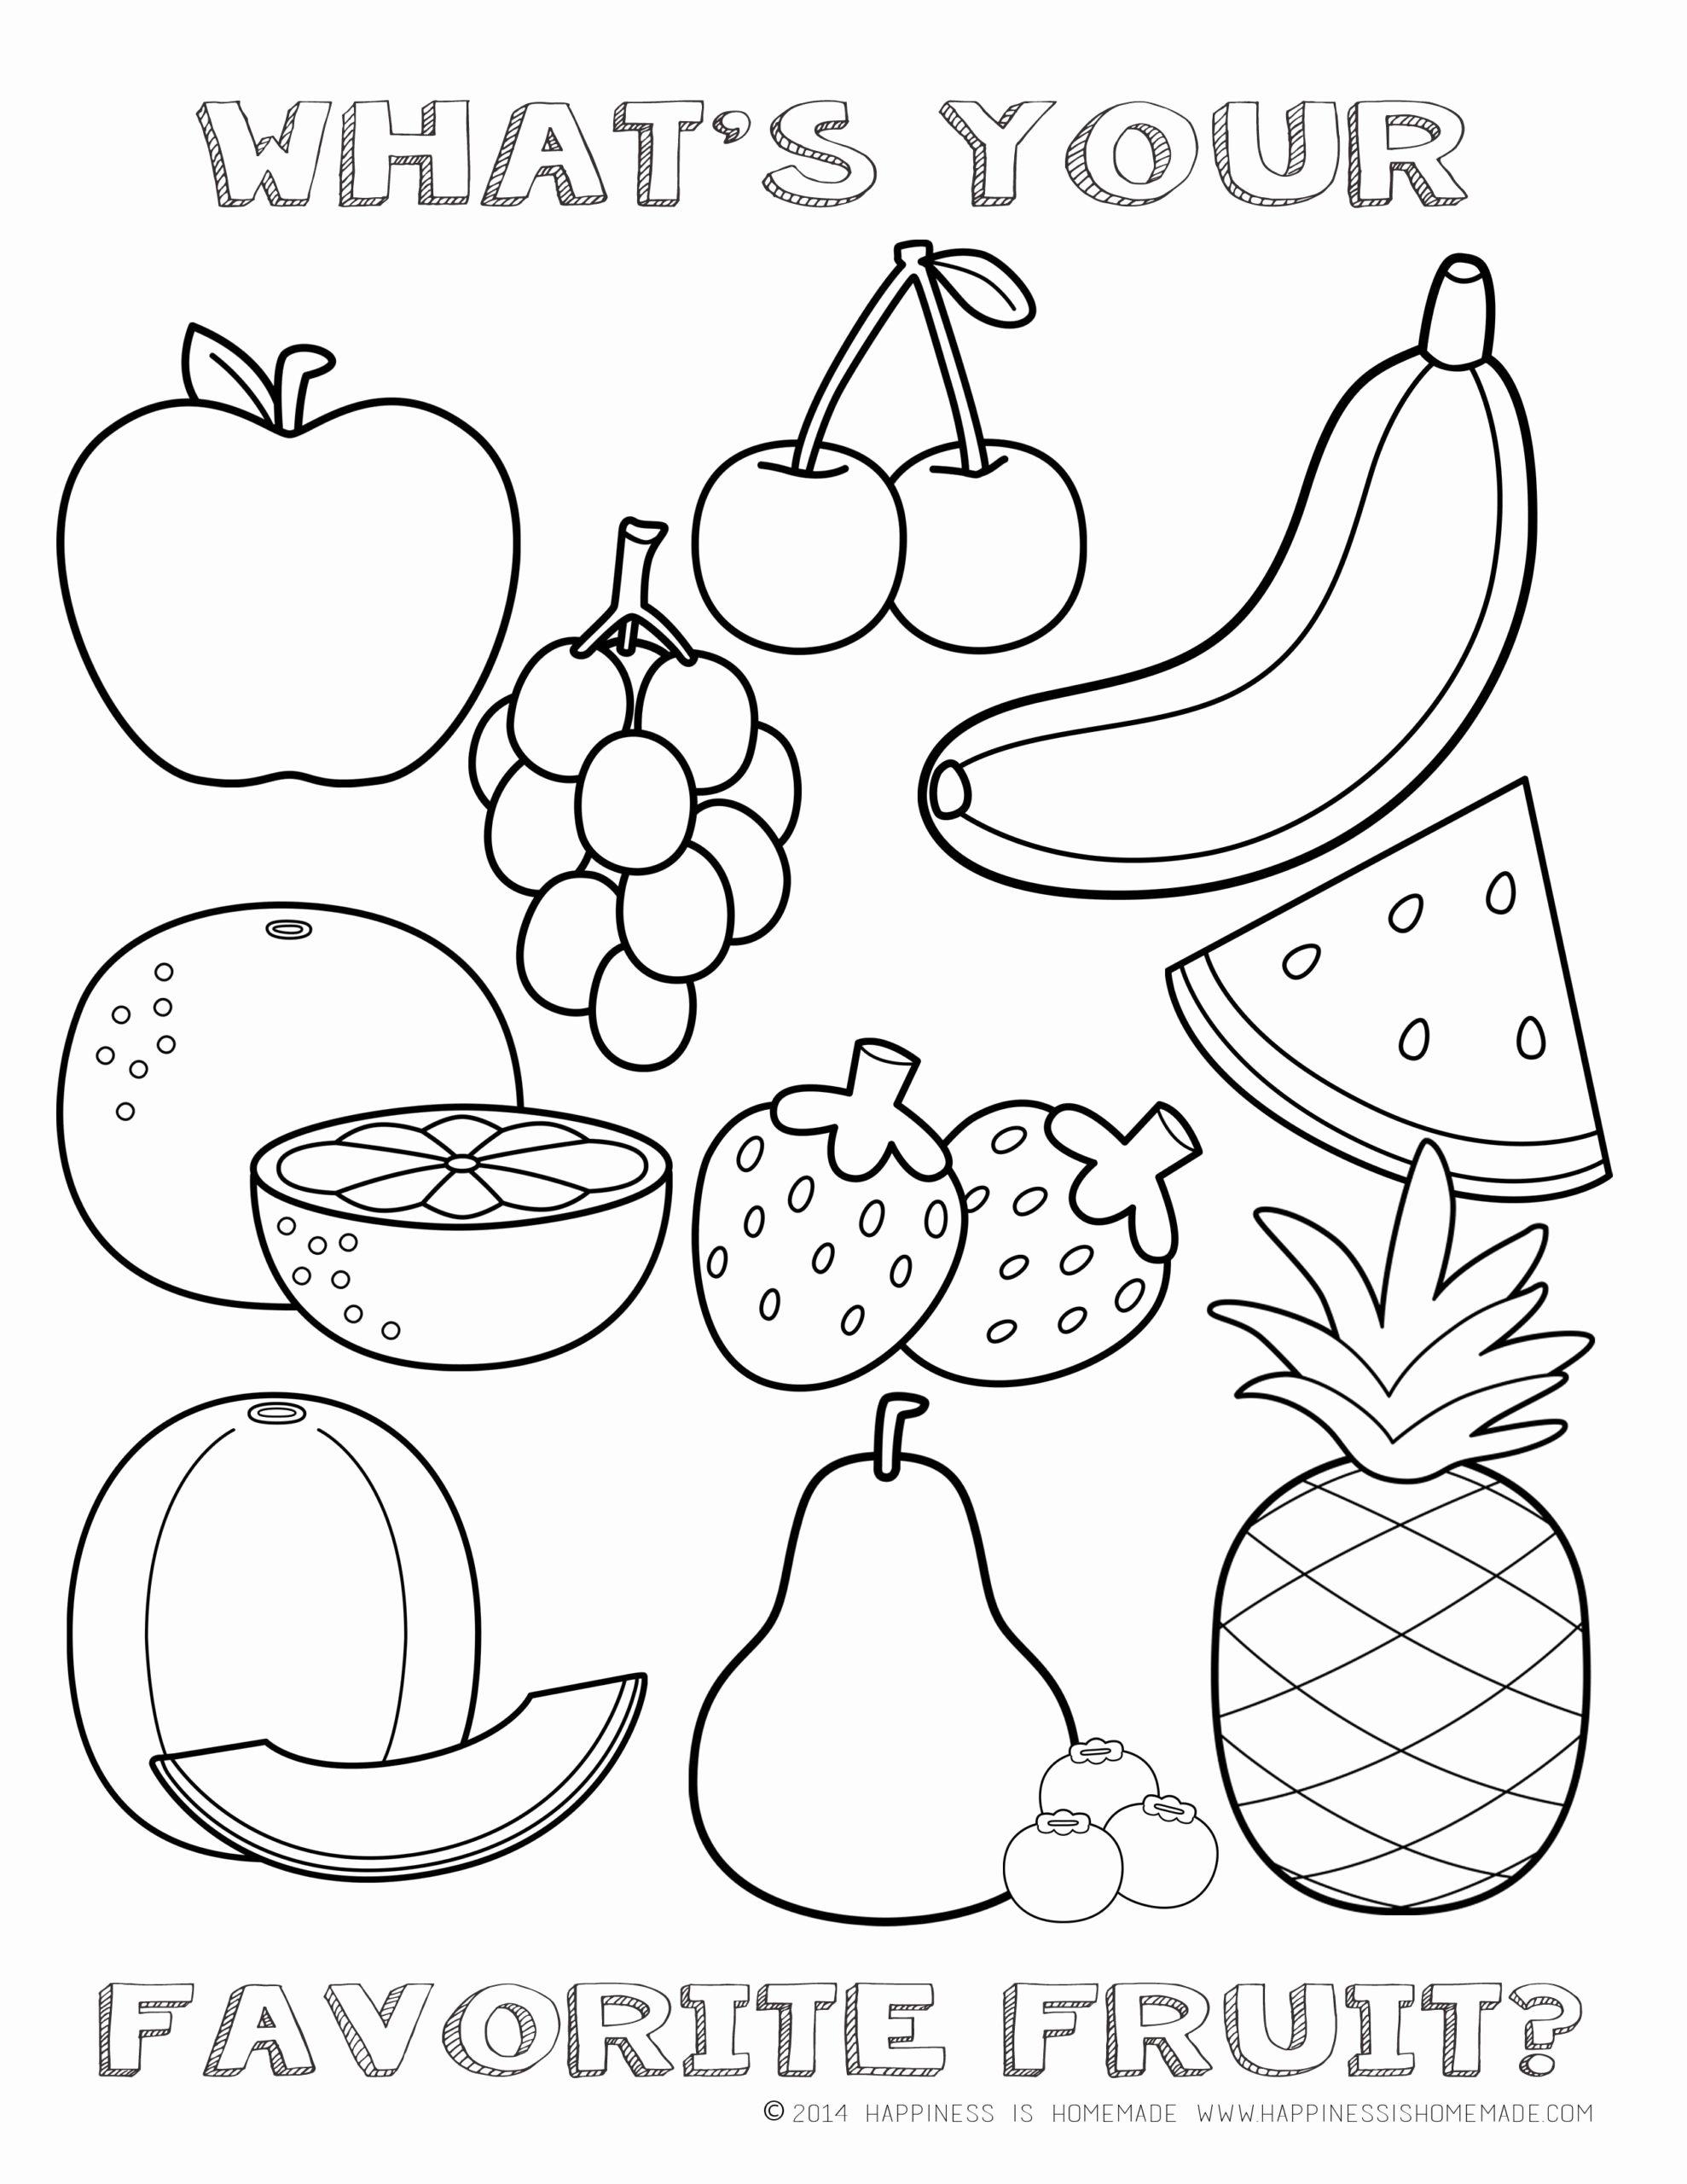 Vegetables Worksheets for Preschoolers Printable Worksheets Ve Ables Worksheet for Preschool Family